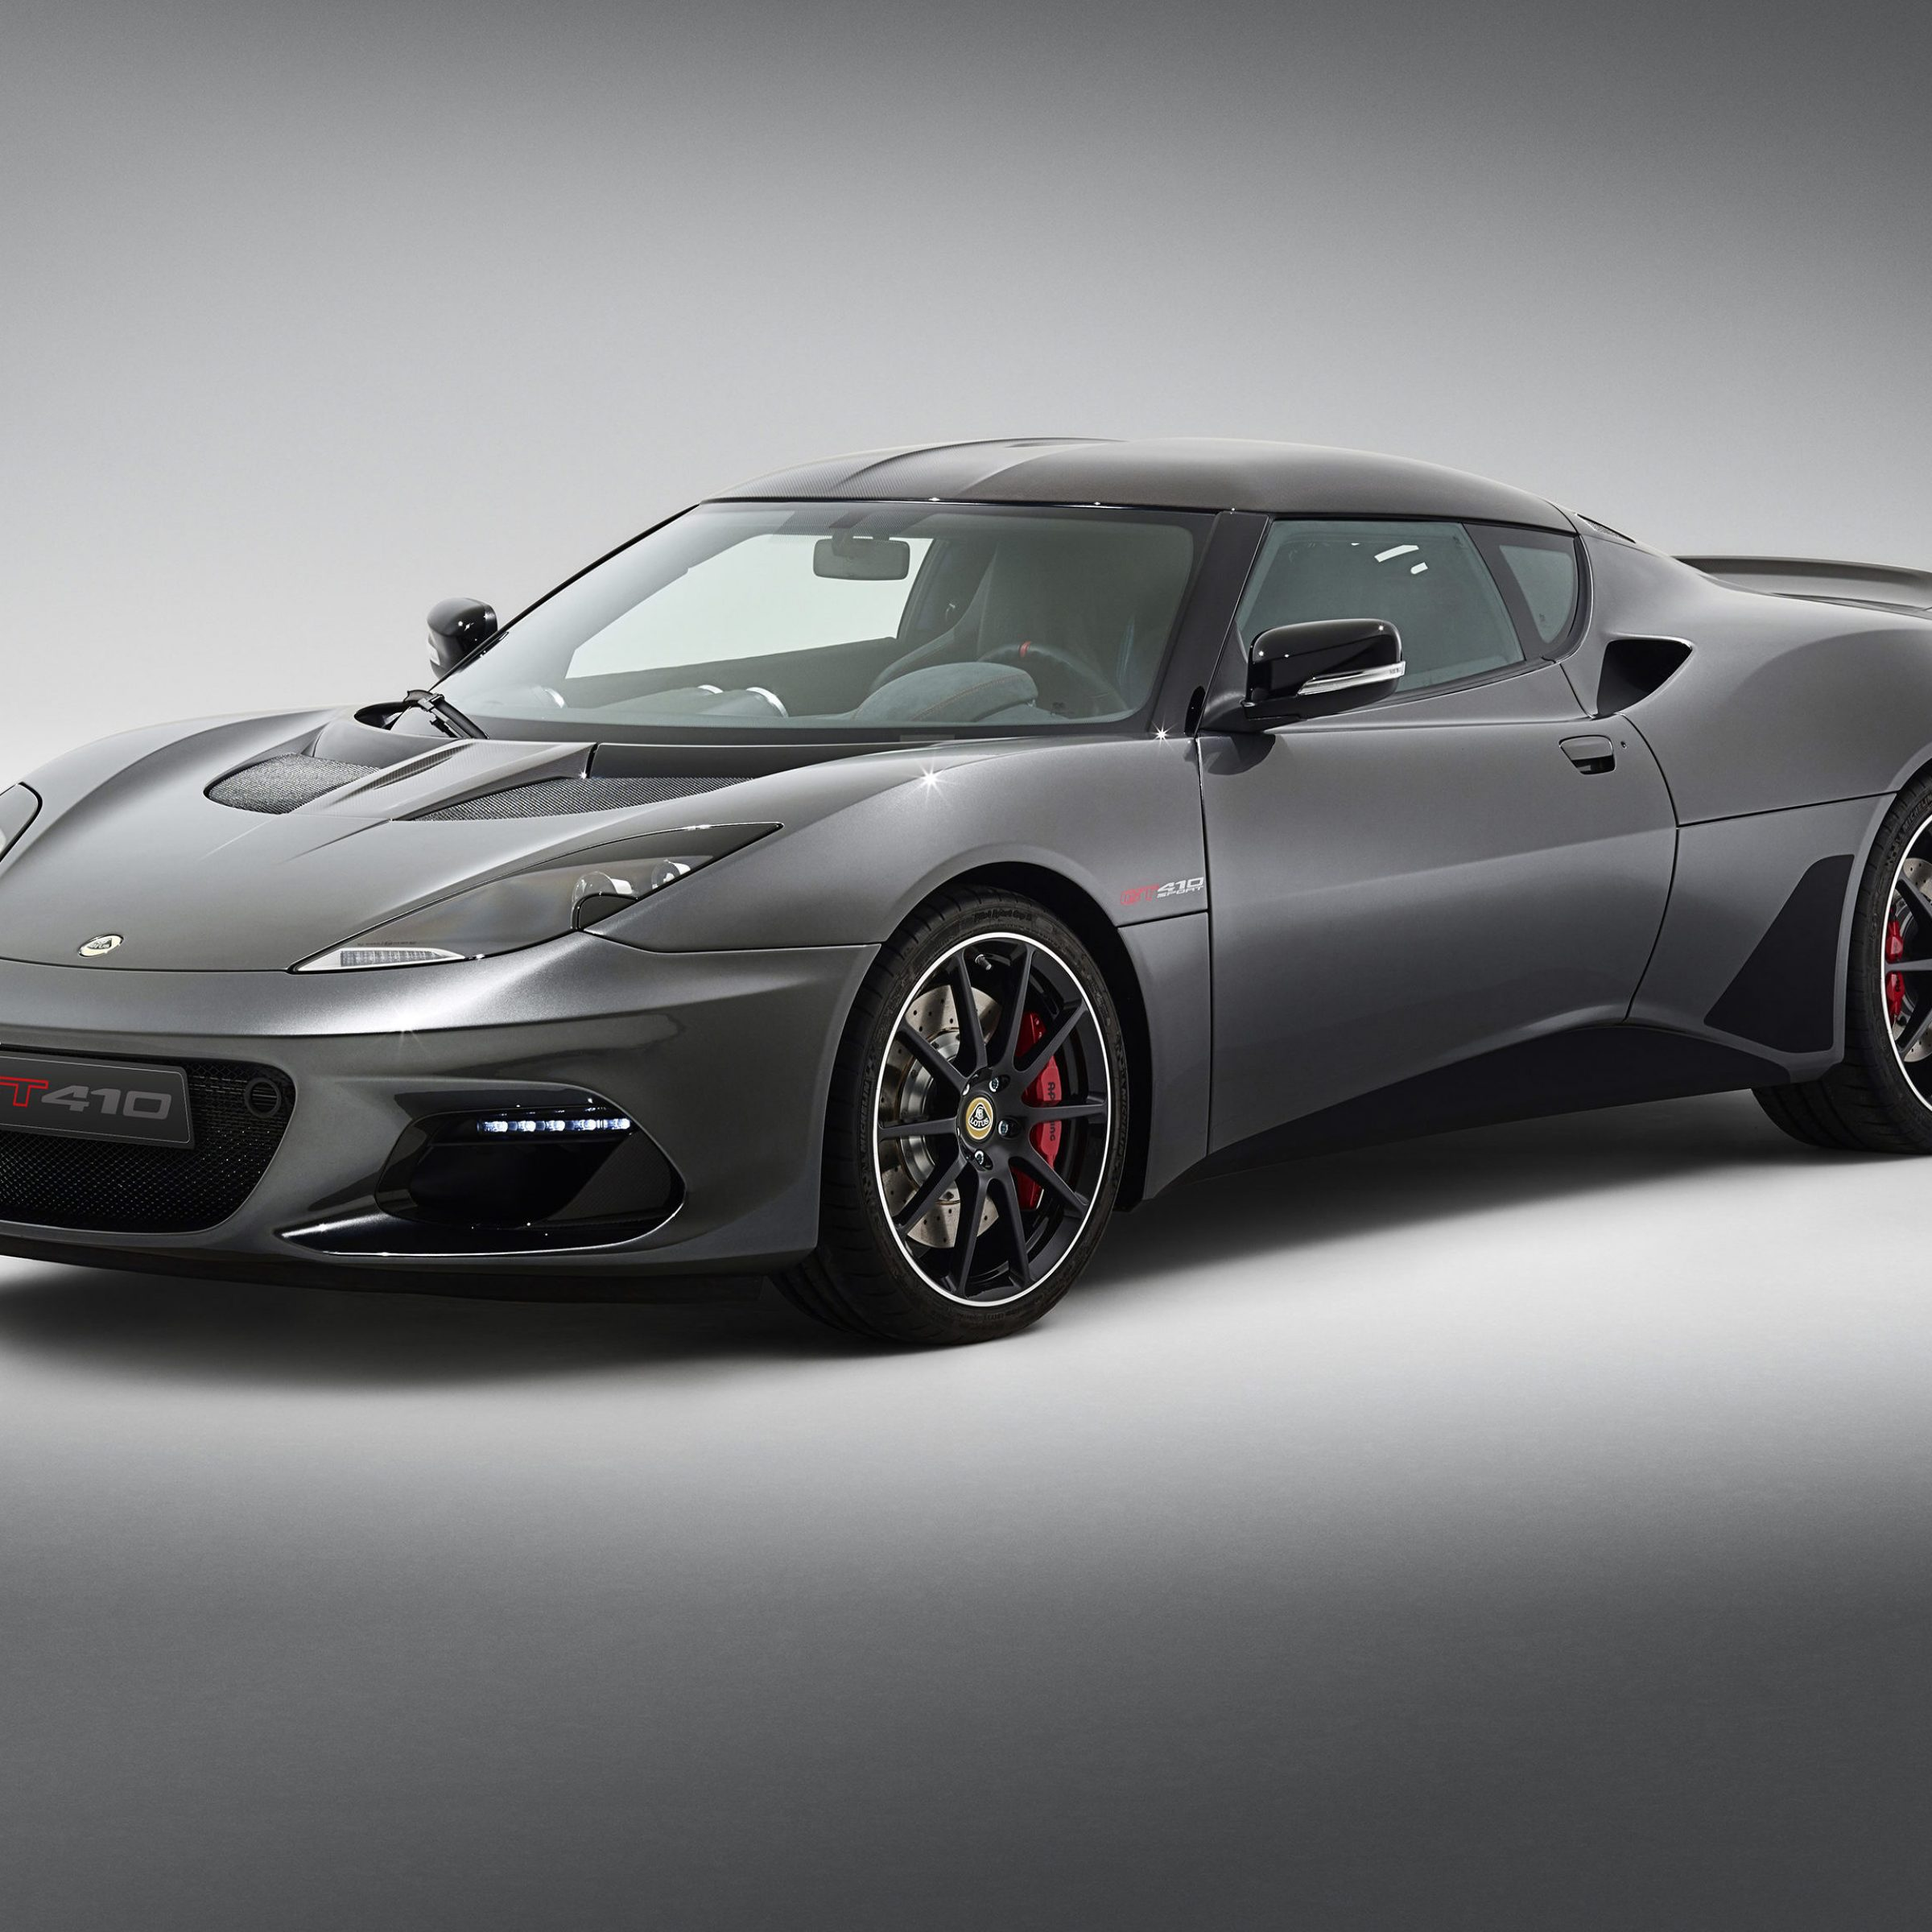 aa61645697d3 Evora GT410 Sport - Lotus Cars